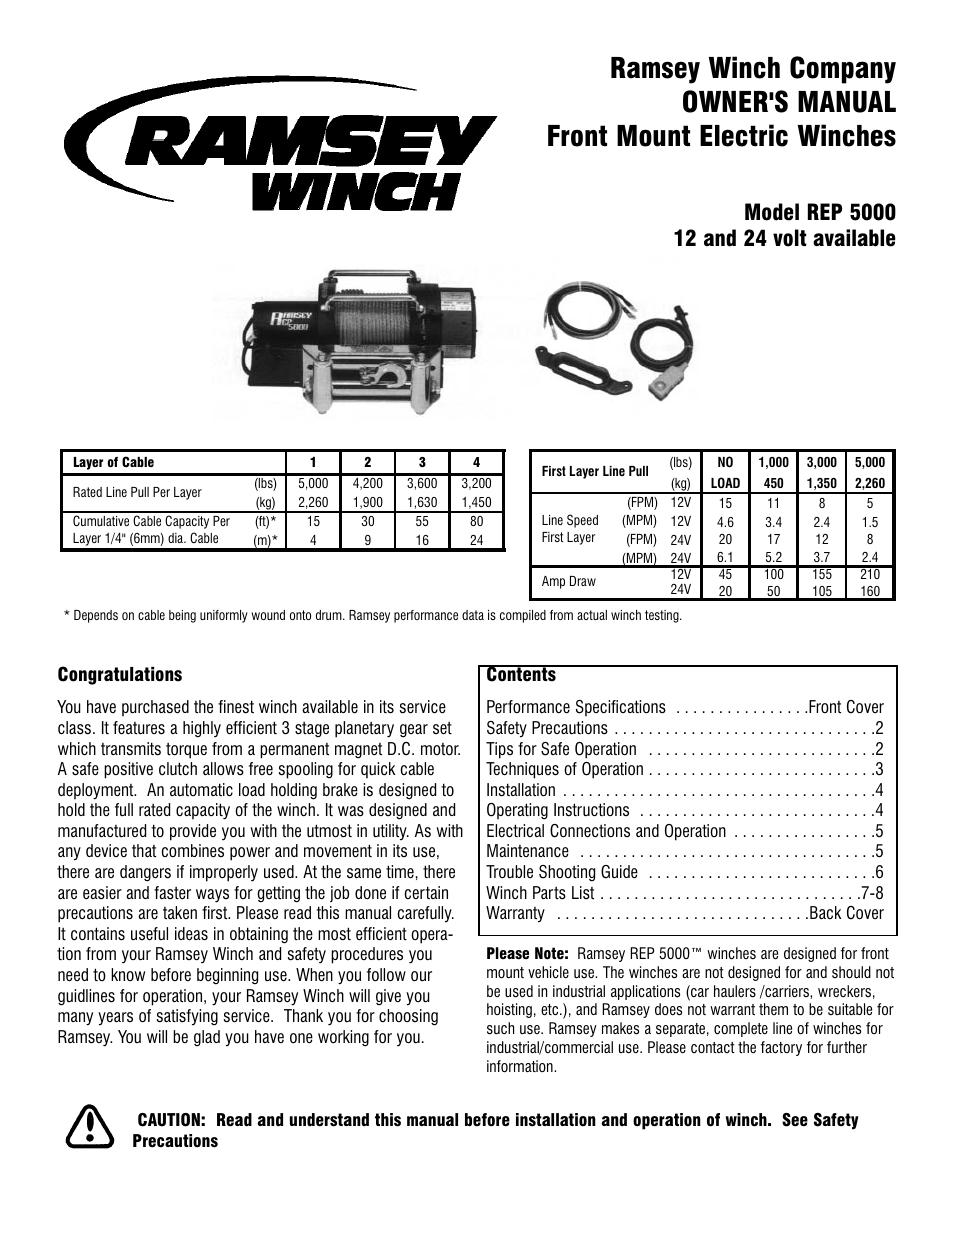 Ramsey 5000 Winch Parts Diagram Smart Wiring Diagrams 8000 Rep User Manual 12 Pages Rh Manualsdir Com Solenoid Old